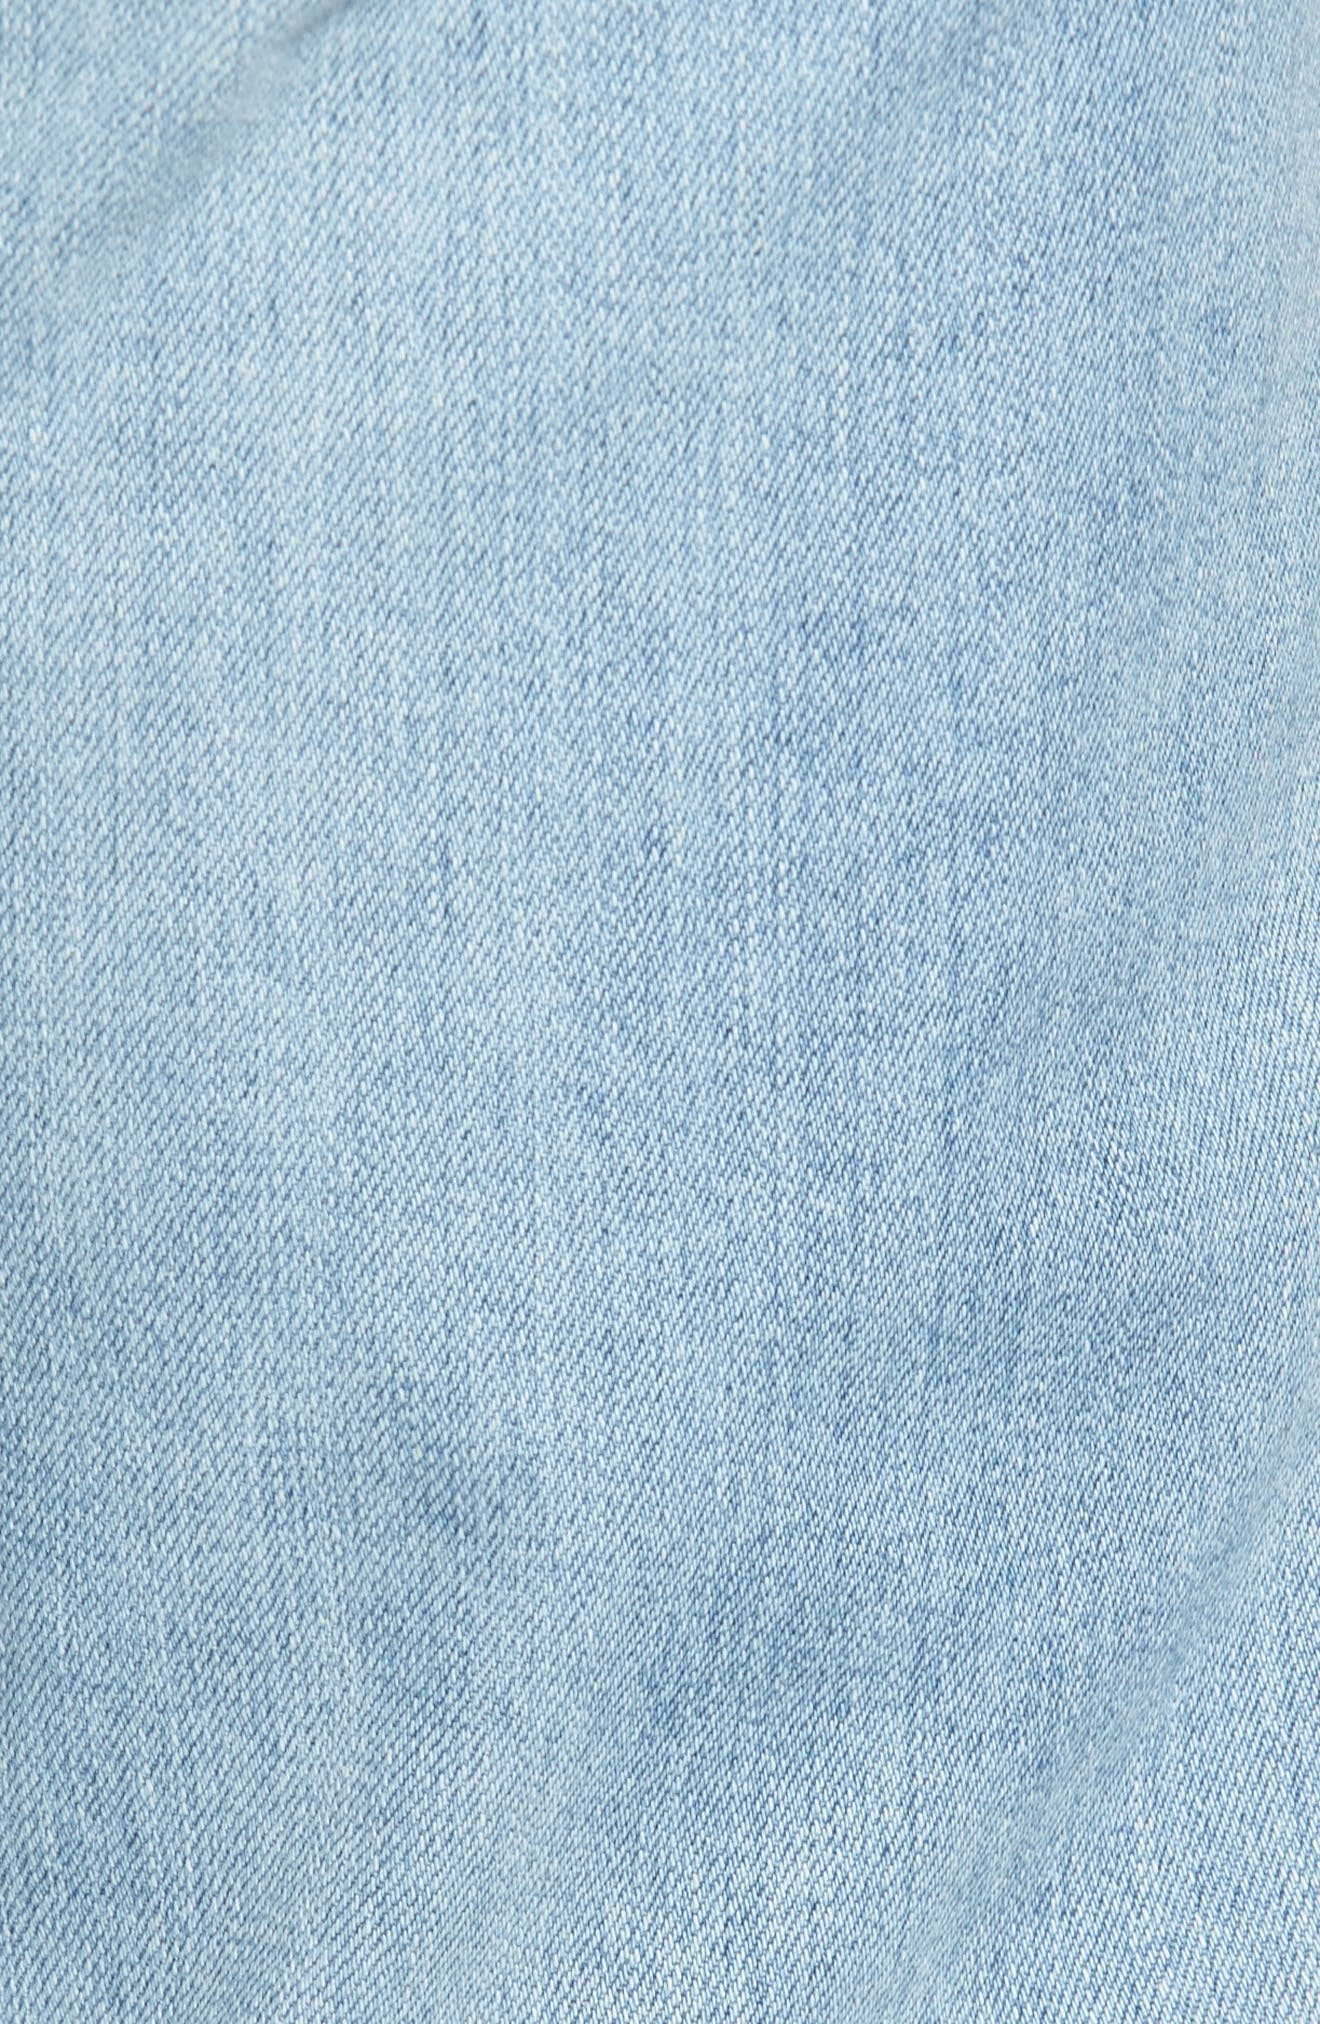 Dylan Slim Skinny Fit Jeans,                             Alternate thumbnail 5, color,                             23 Years Oceanside